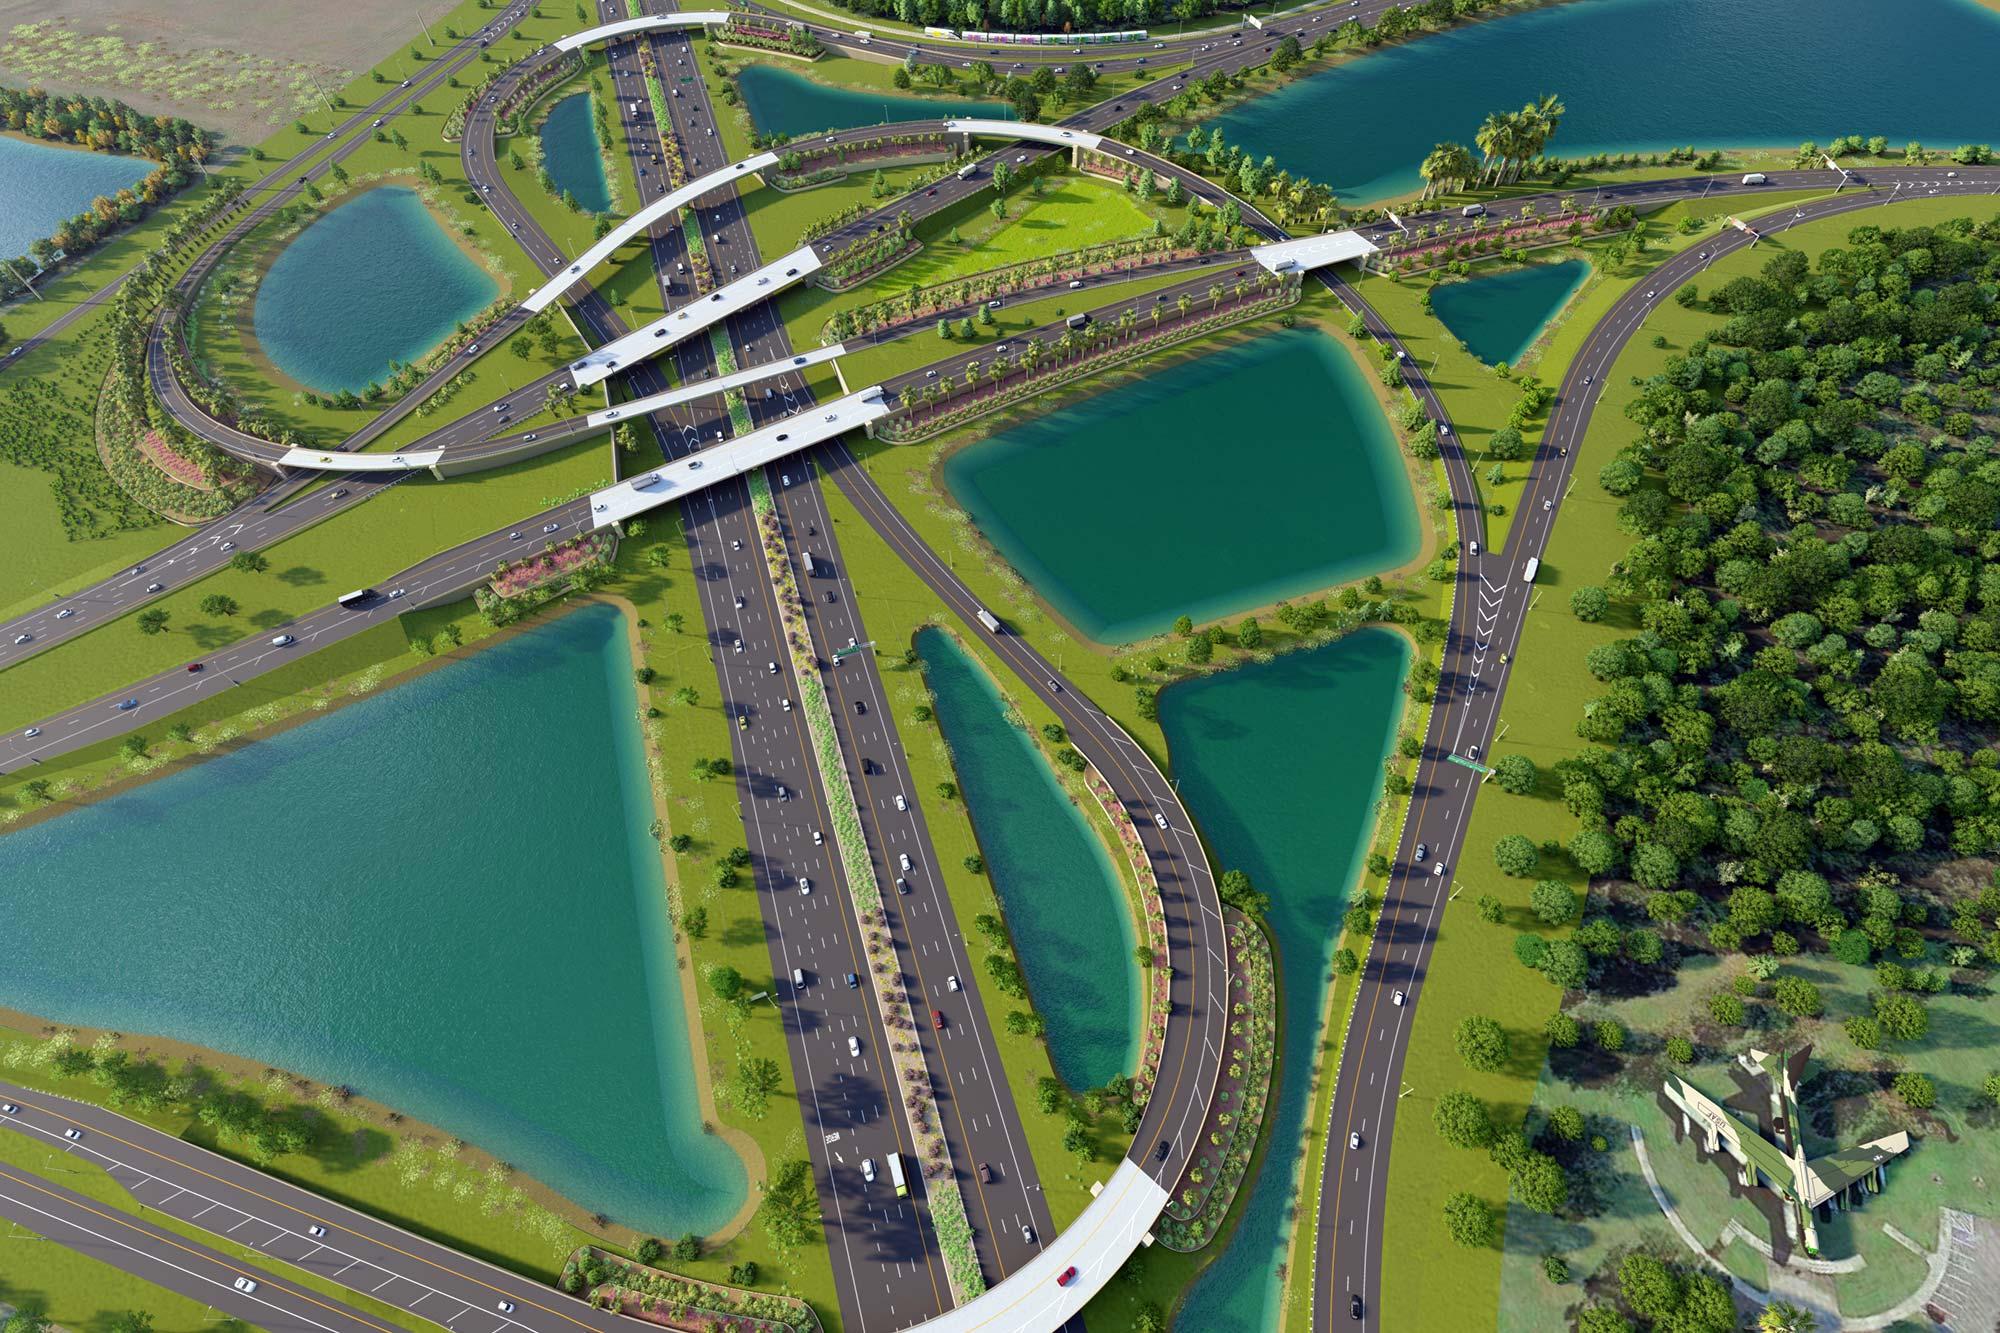 SR 528/SR 436 Interchange